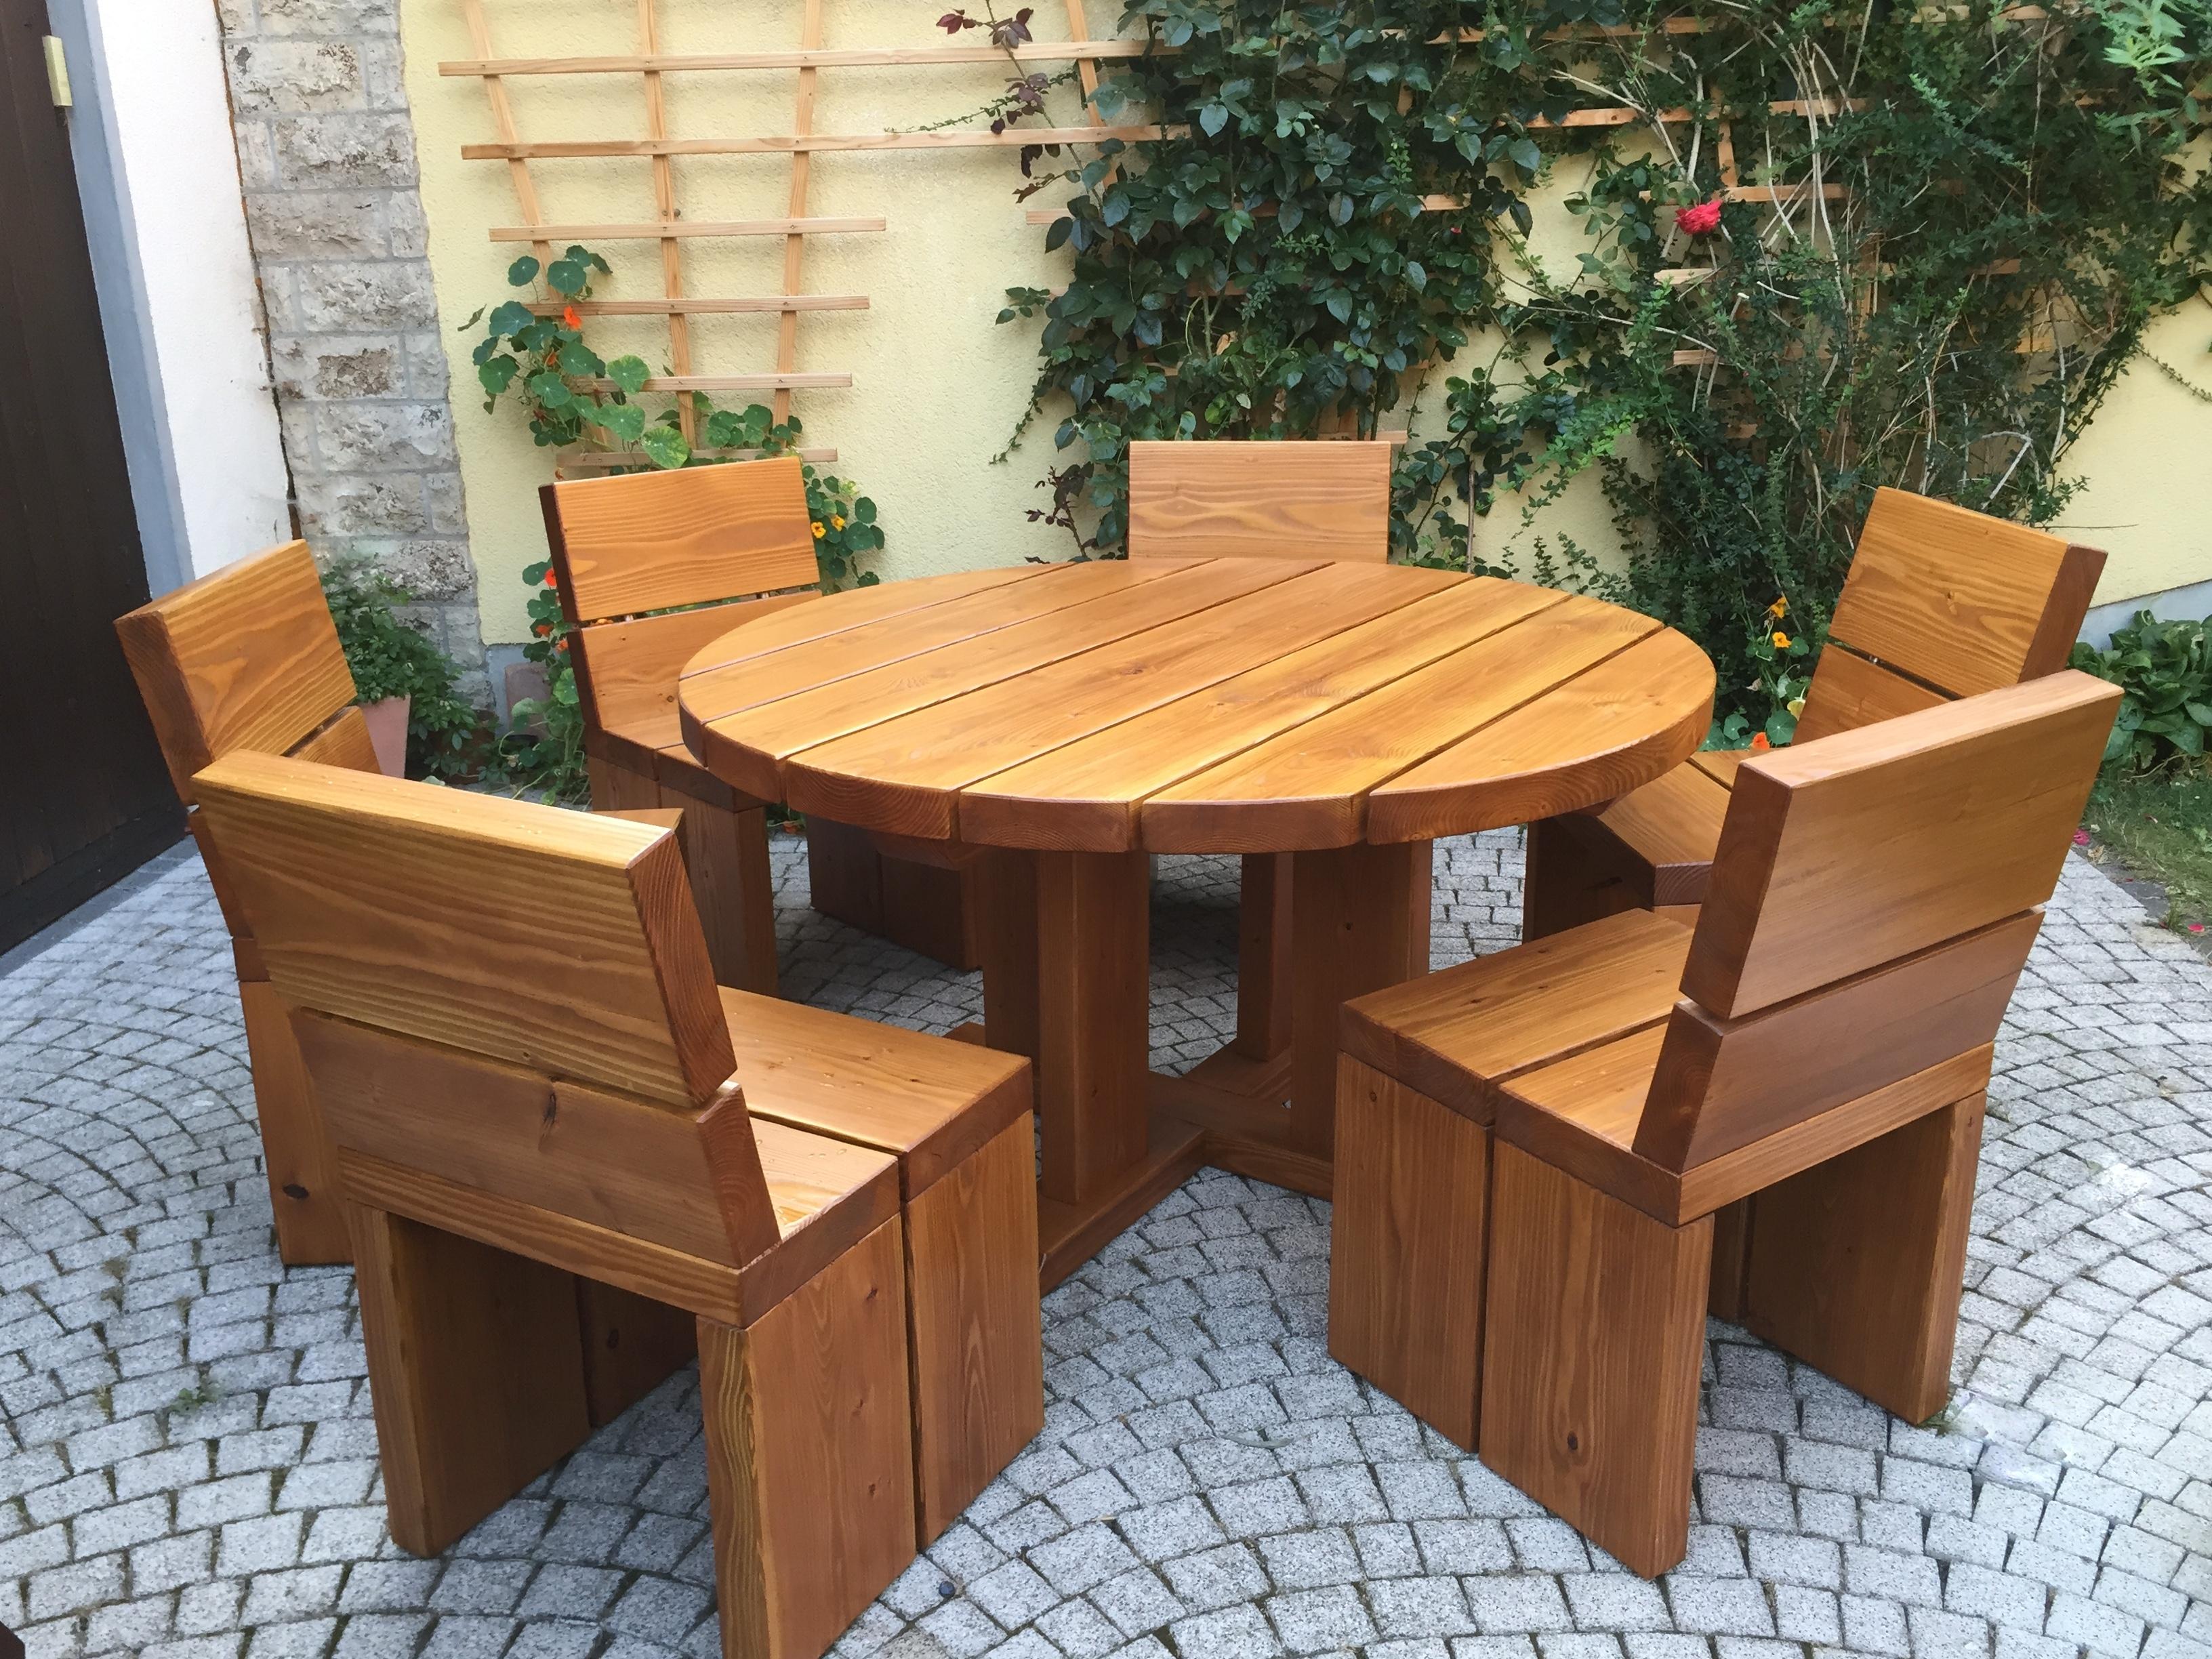 sitzgruppe mit rundem tisch in douglasie scholz holz. Black Bedroom Furniture Sets. Home Design Ideas